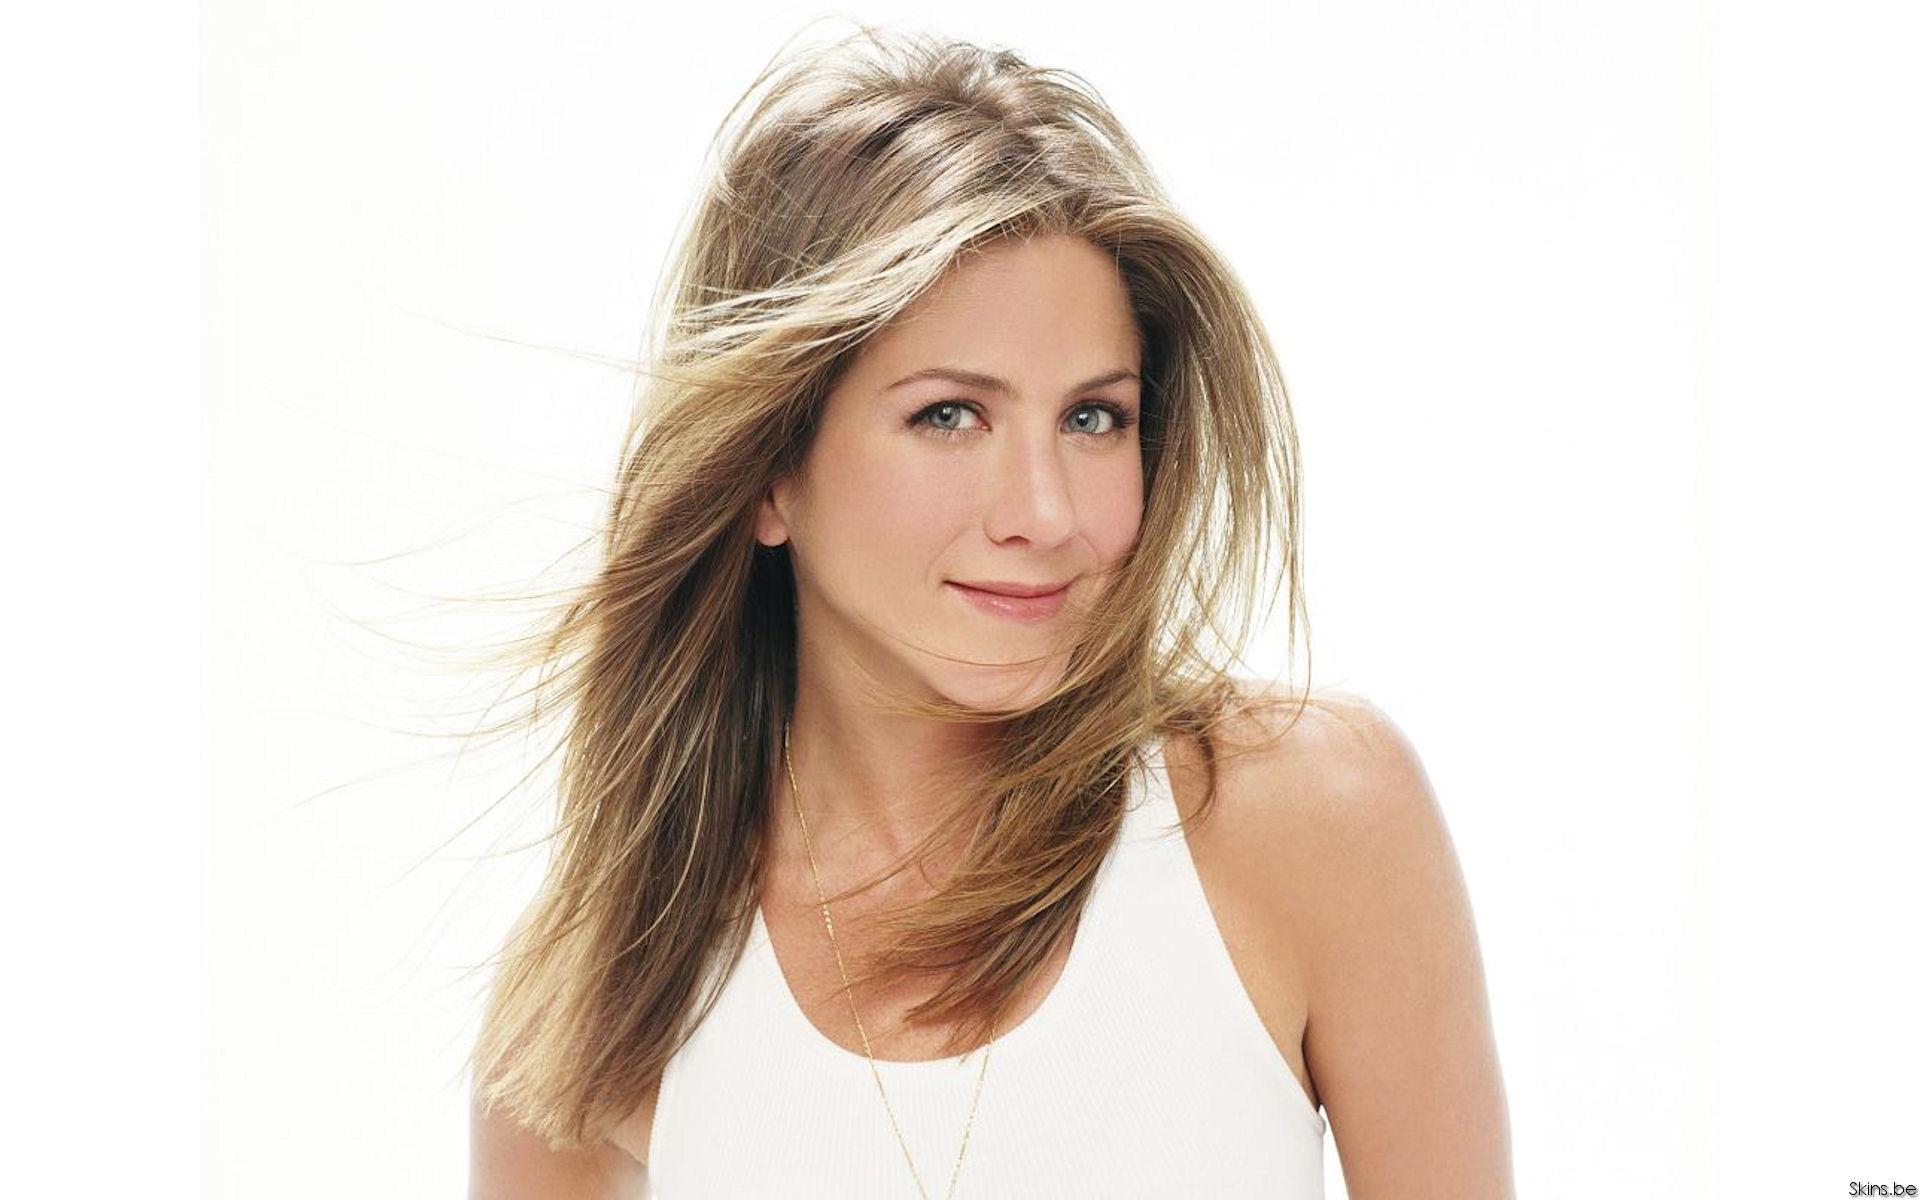 Jennifer Aniston 2013 - 1920x1200